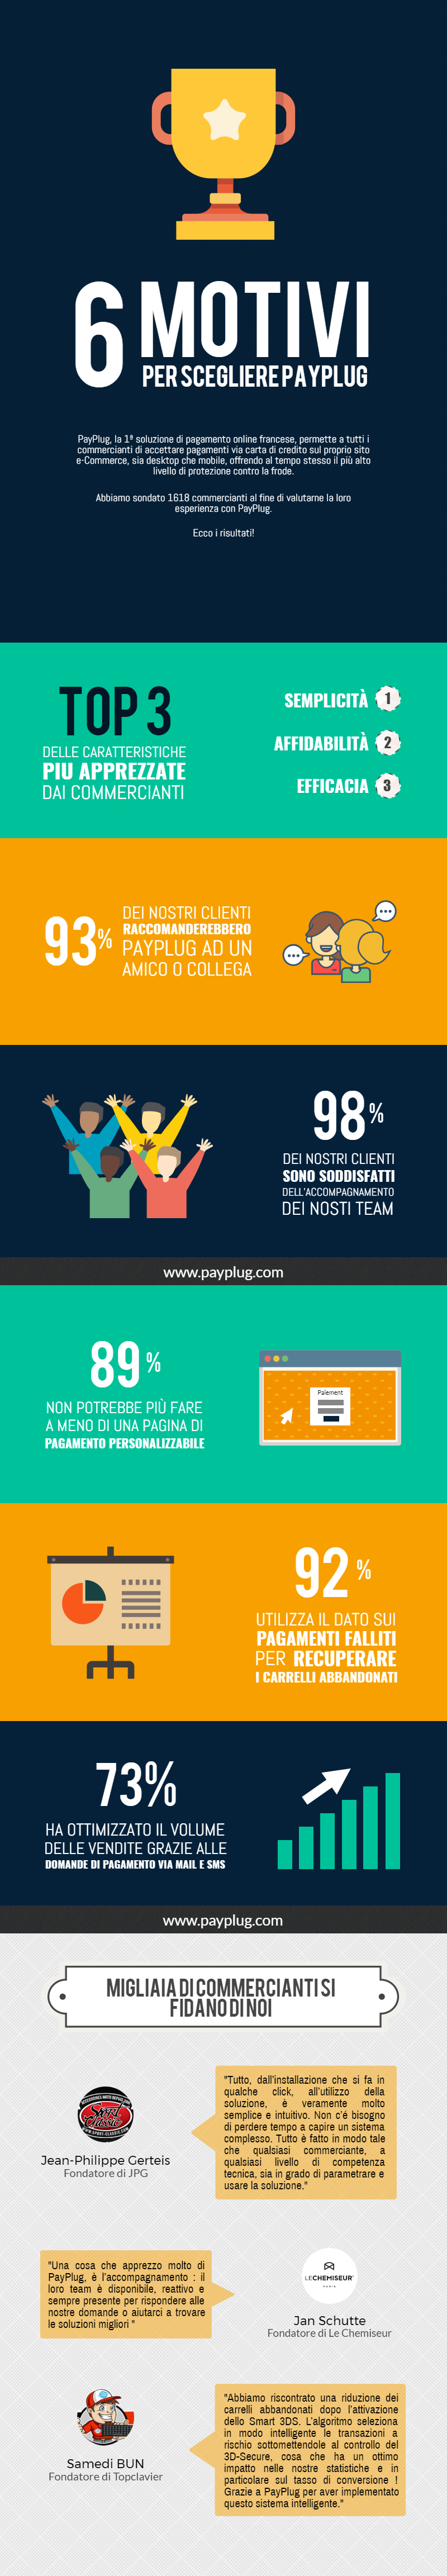 IT201708_blog_payplug_Infographie_6_raisons_choisir_PP_image.png